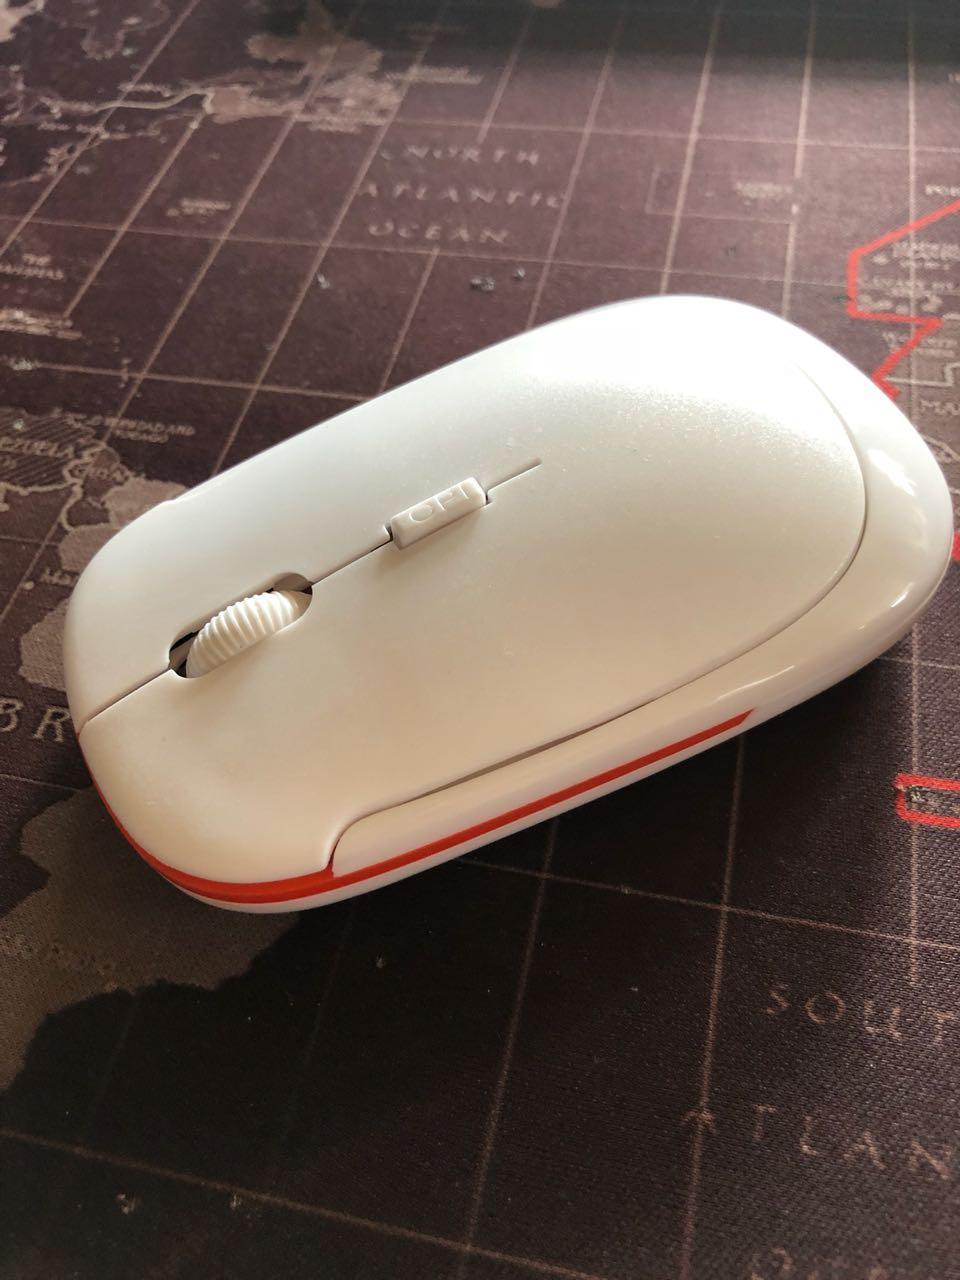 Harga Dan Spek Mouse Wireless Advance Wm501 Original Wm 501 0476752 Kotobukiya Gz990 Lightsaber Chopsticks Kylo Ren Light Up Buy Sell Cheapest B Best Quality Product Deals Indonesian